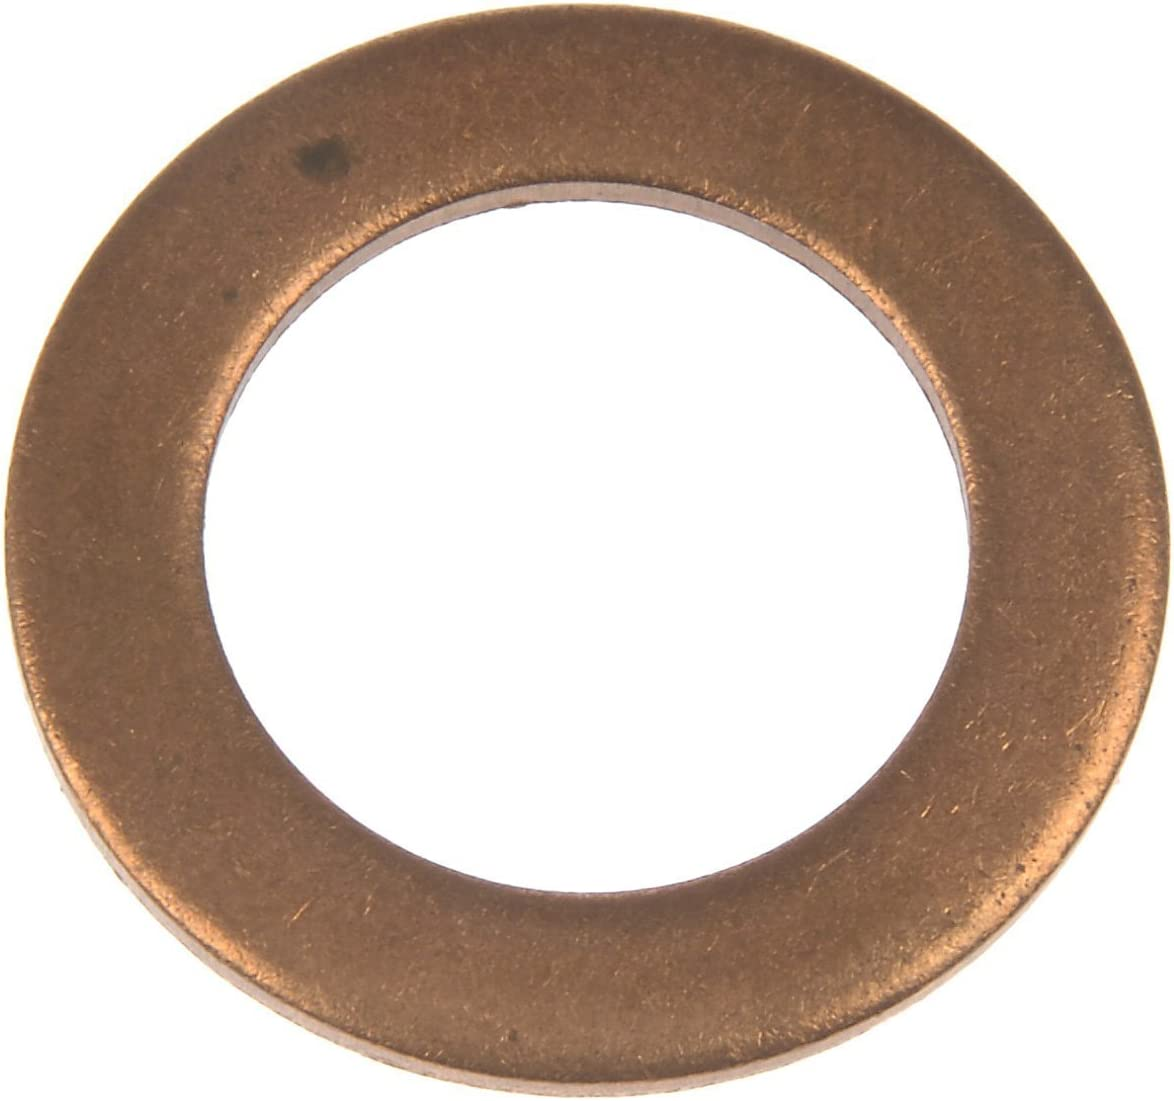 25 Copper Oil Drain Plug Gaskets 12MM I.D. 20MM O.D. by A Plus Parts House